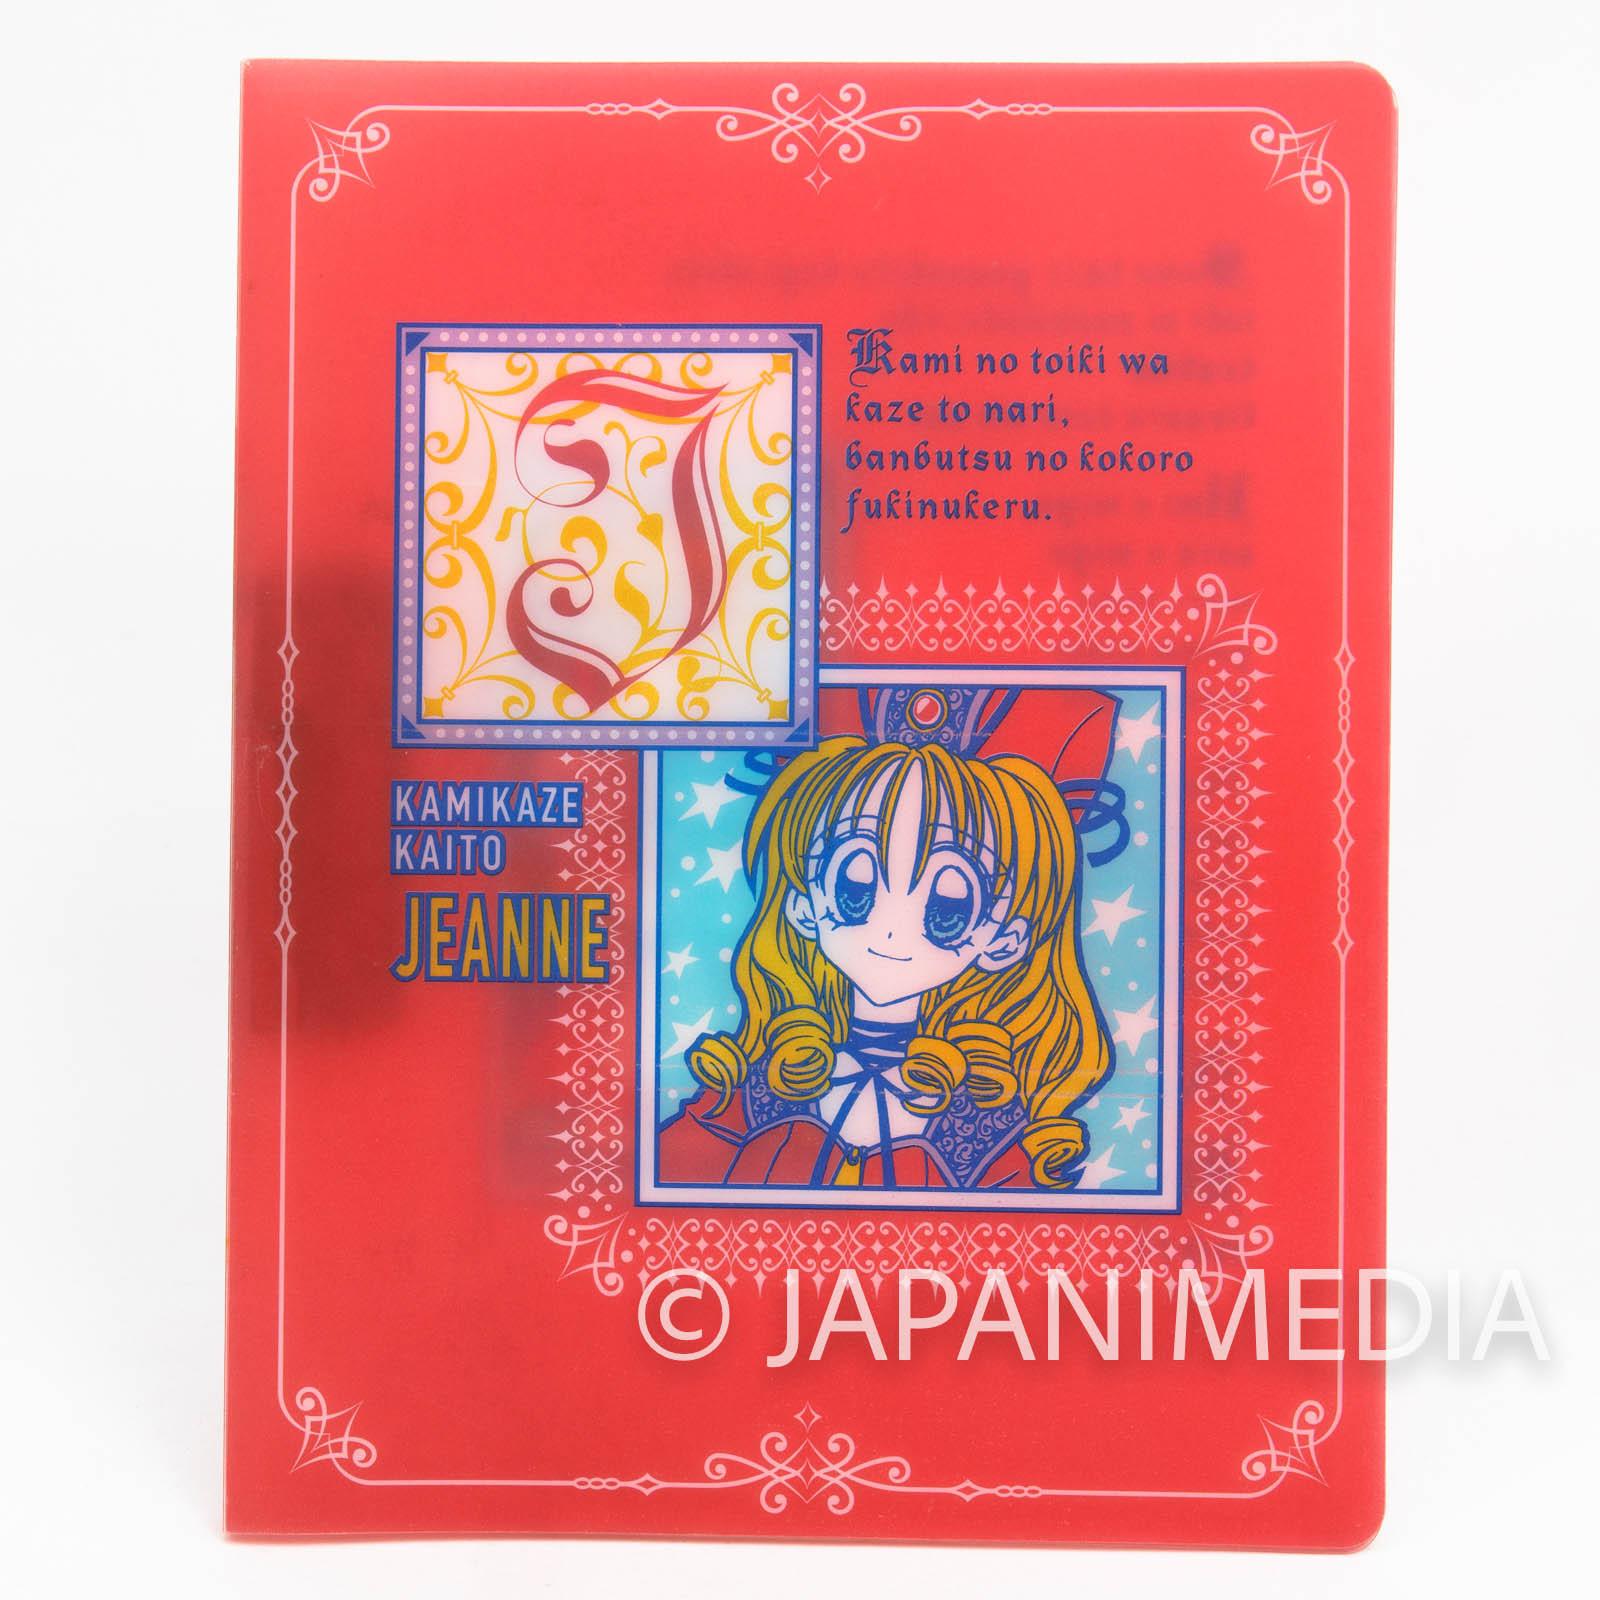 Kamikaze Kaitou Jeanne Binder File Ribon JAPAN MANGA